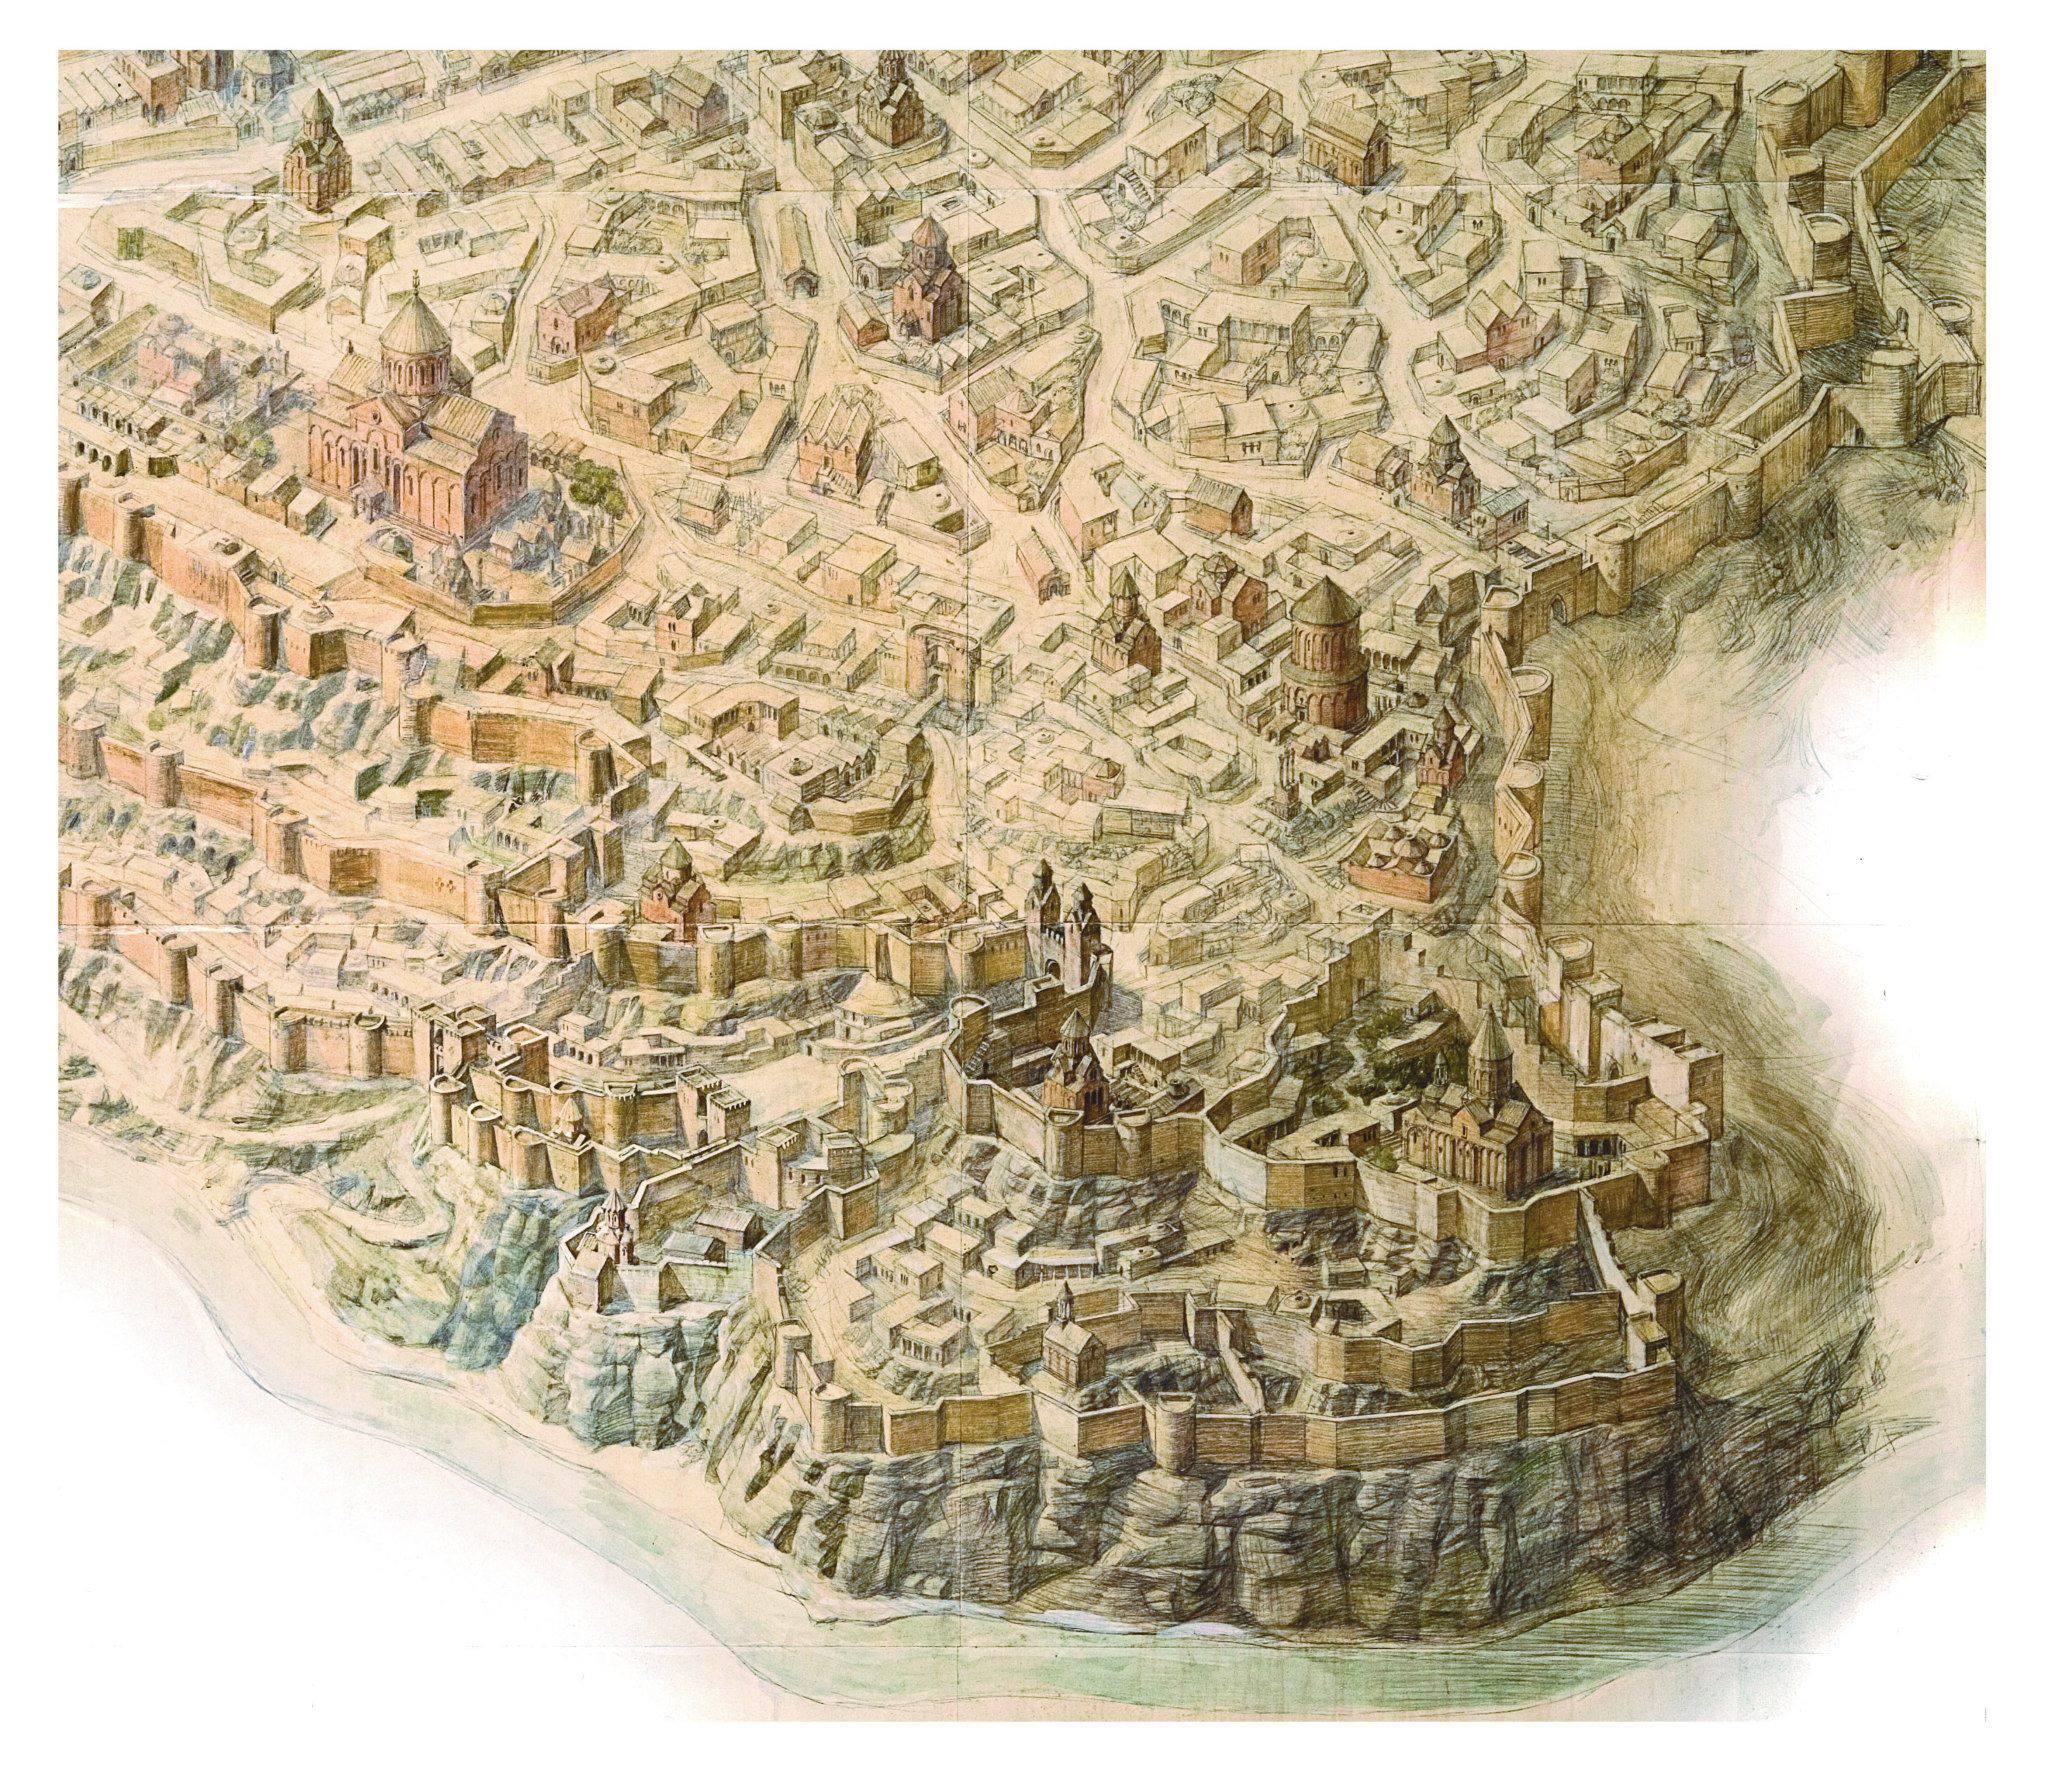 Ani city of 1001 churches